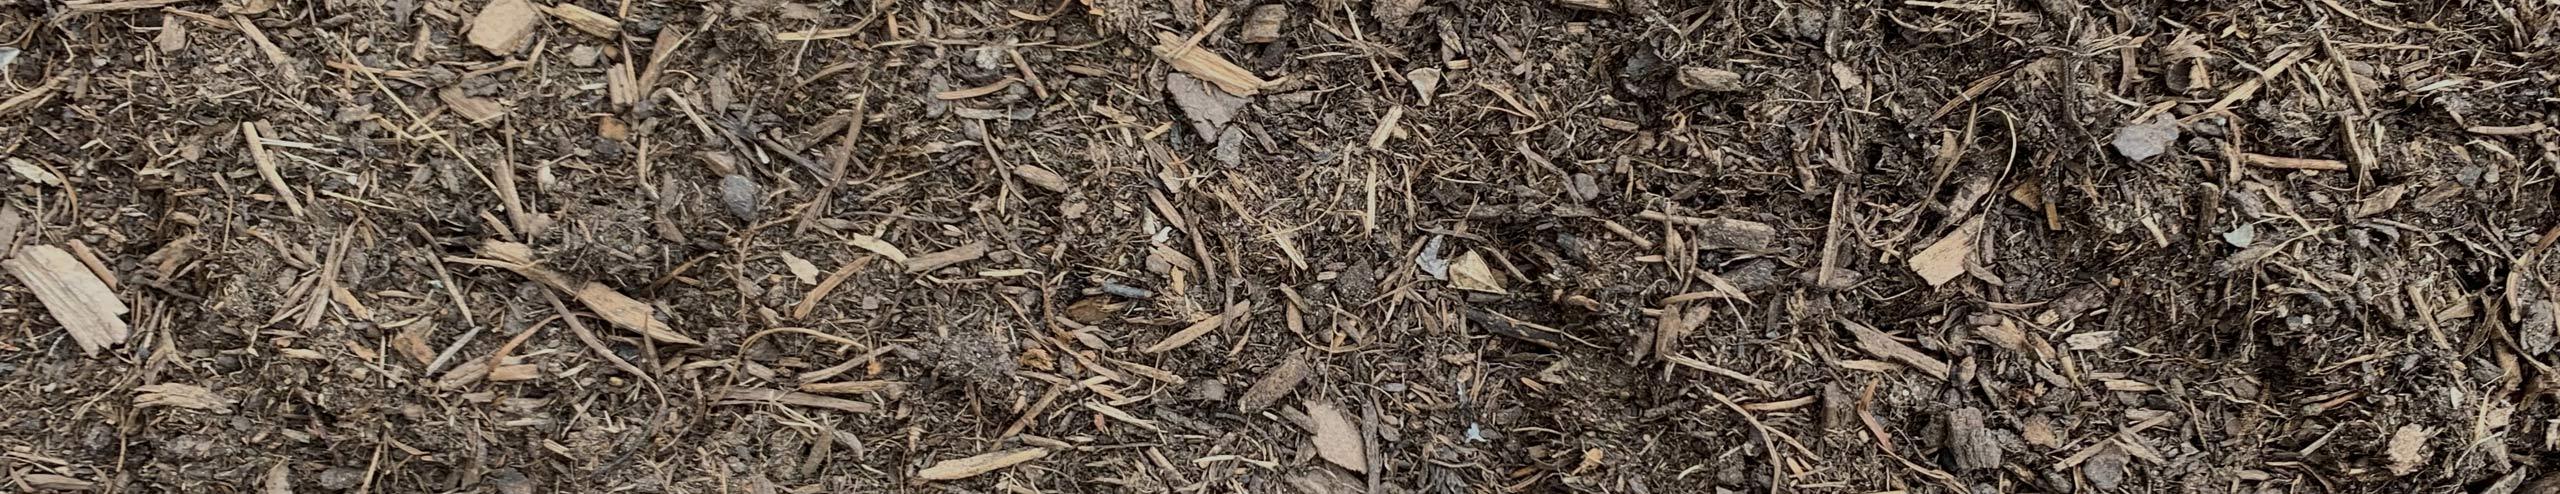 Composts-Header-Lrg